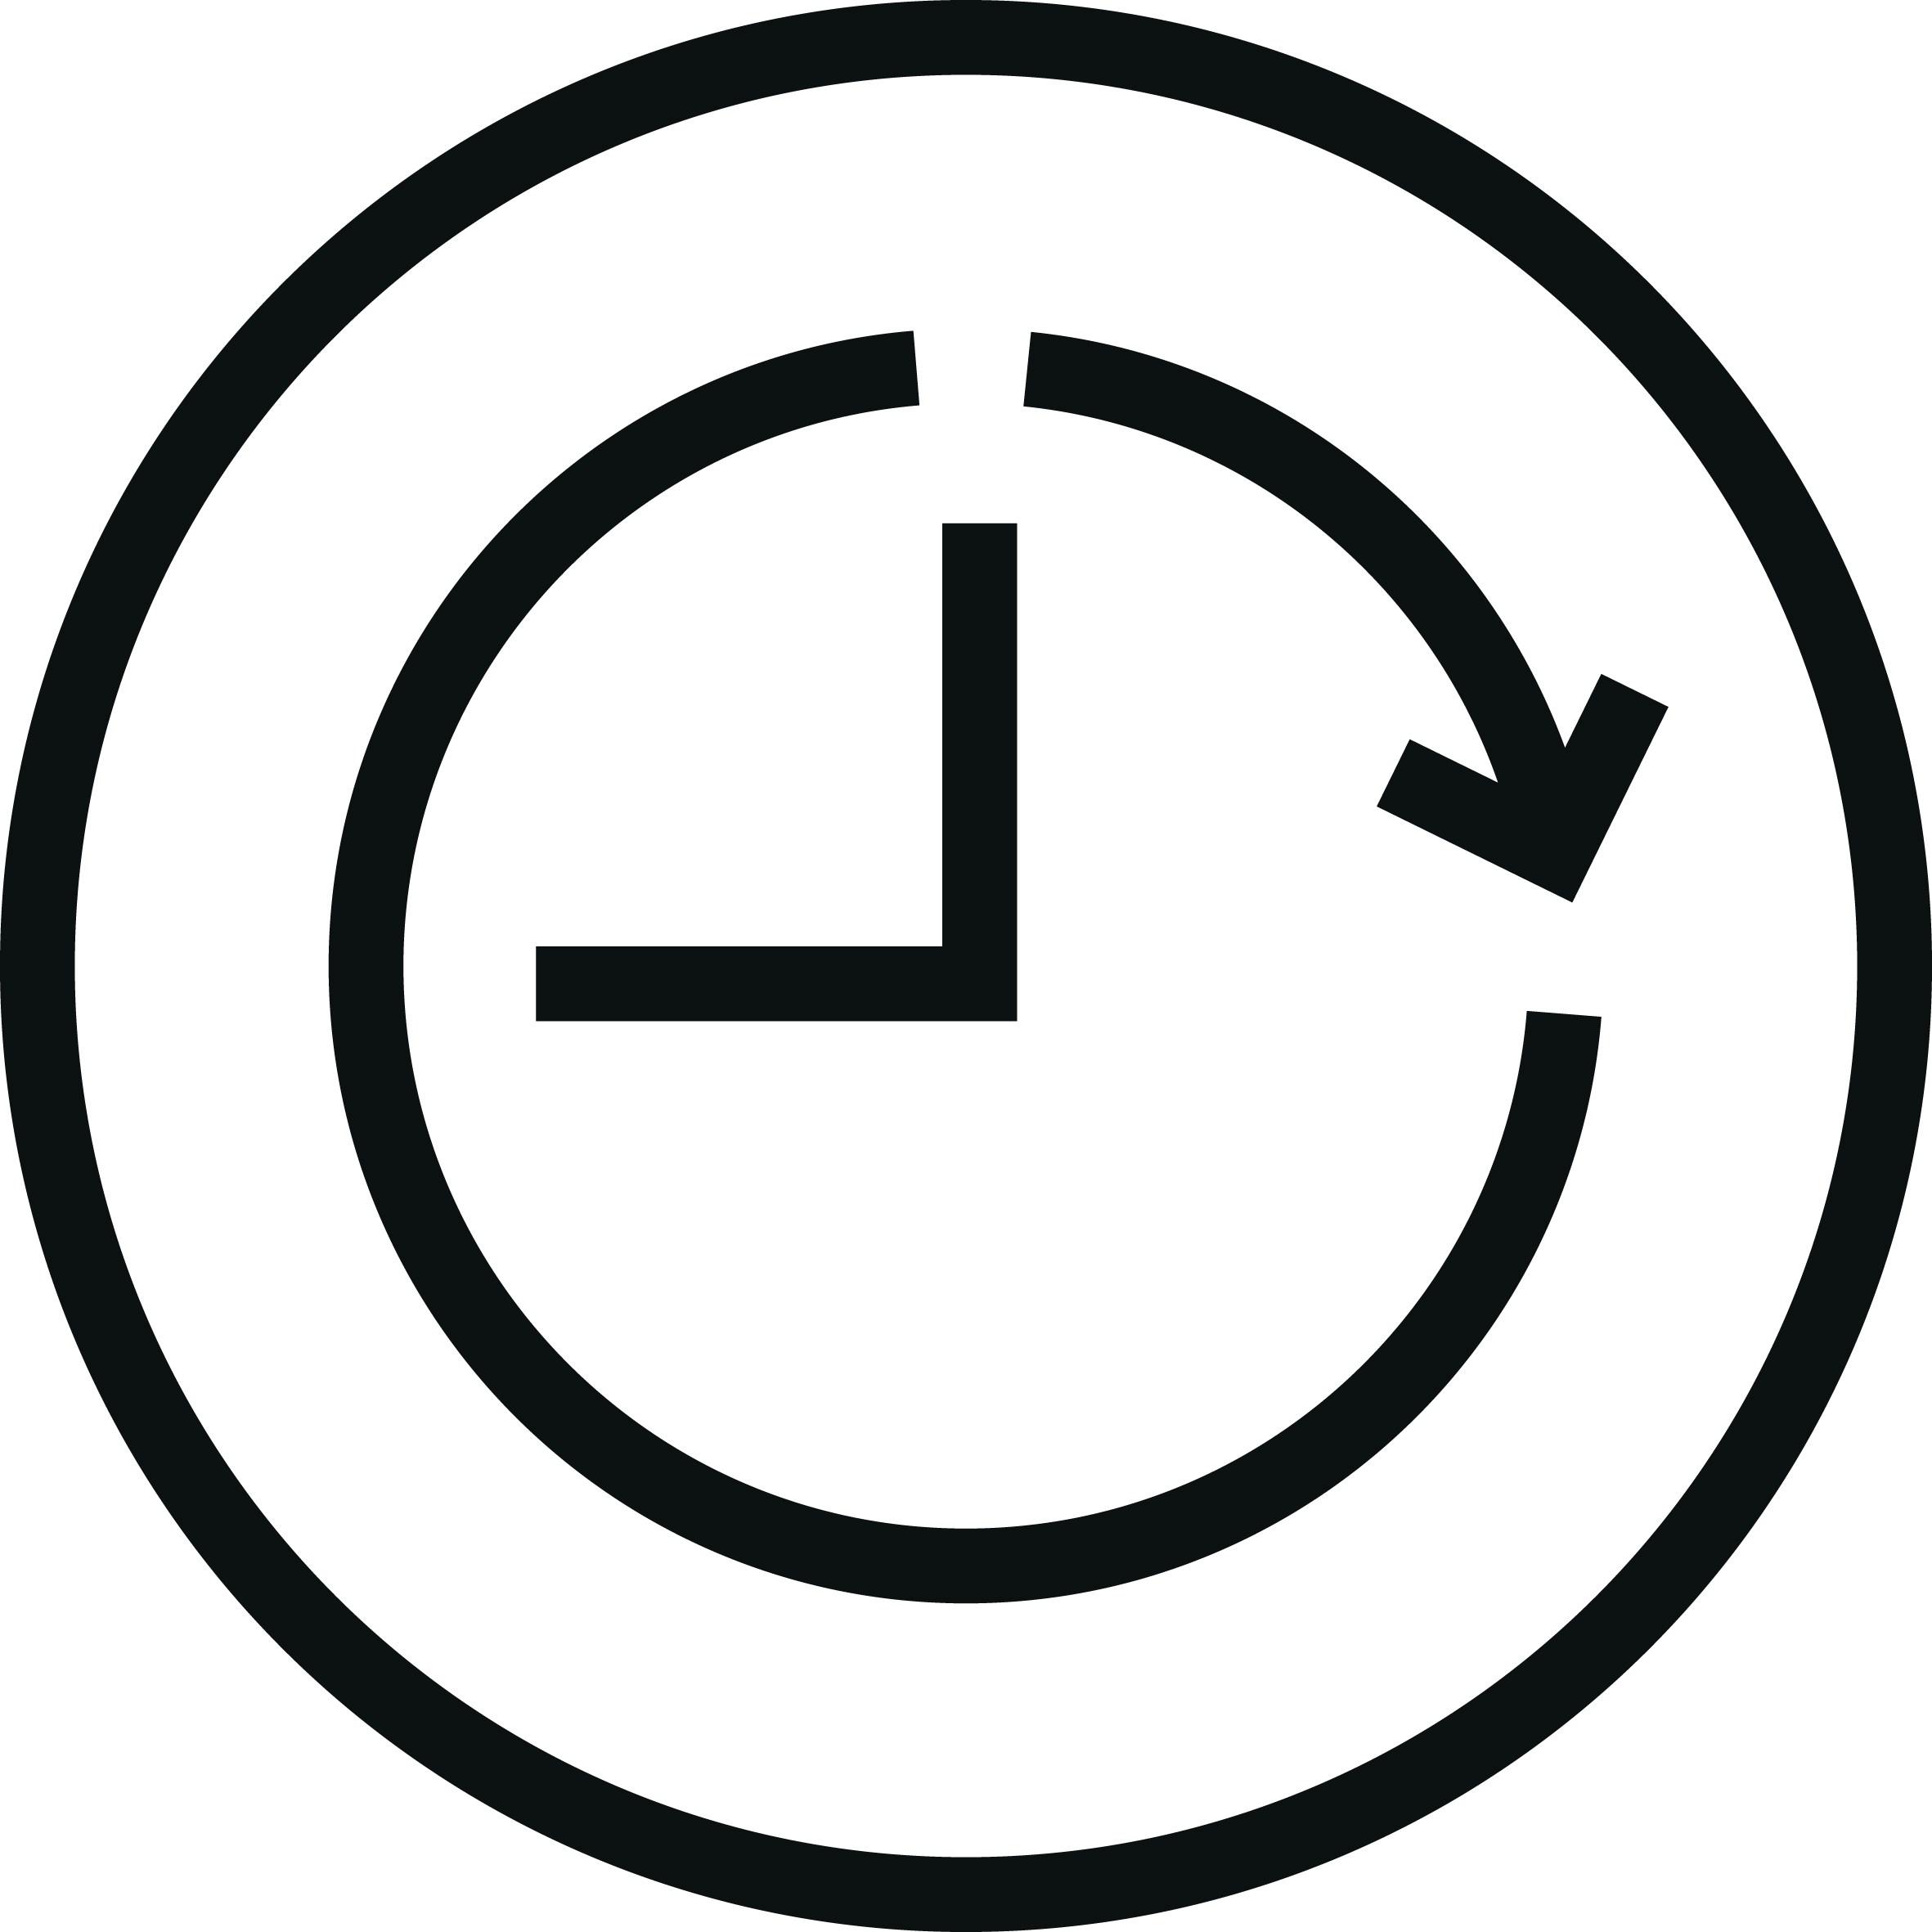 Rest_Time-PSAADY16PC569014.jpg